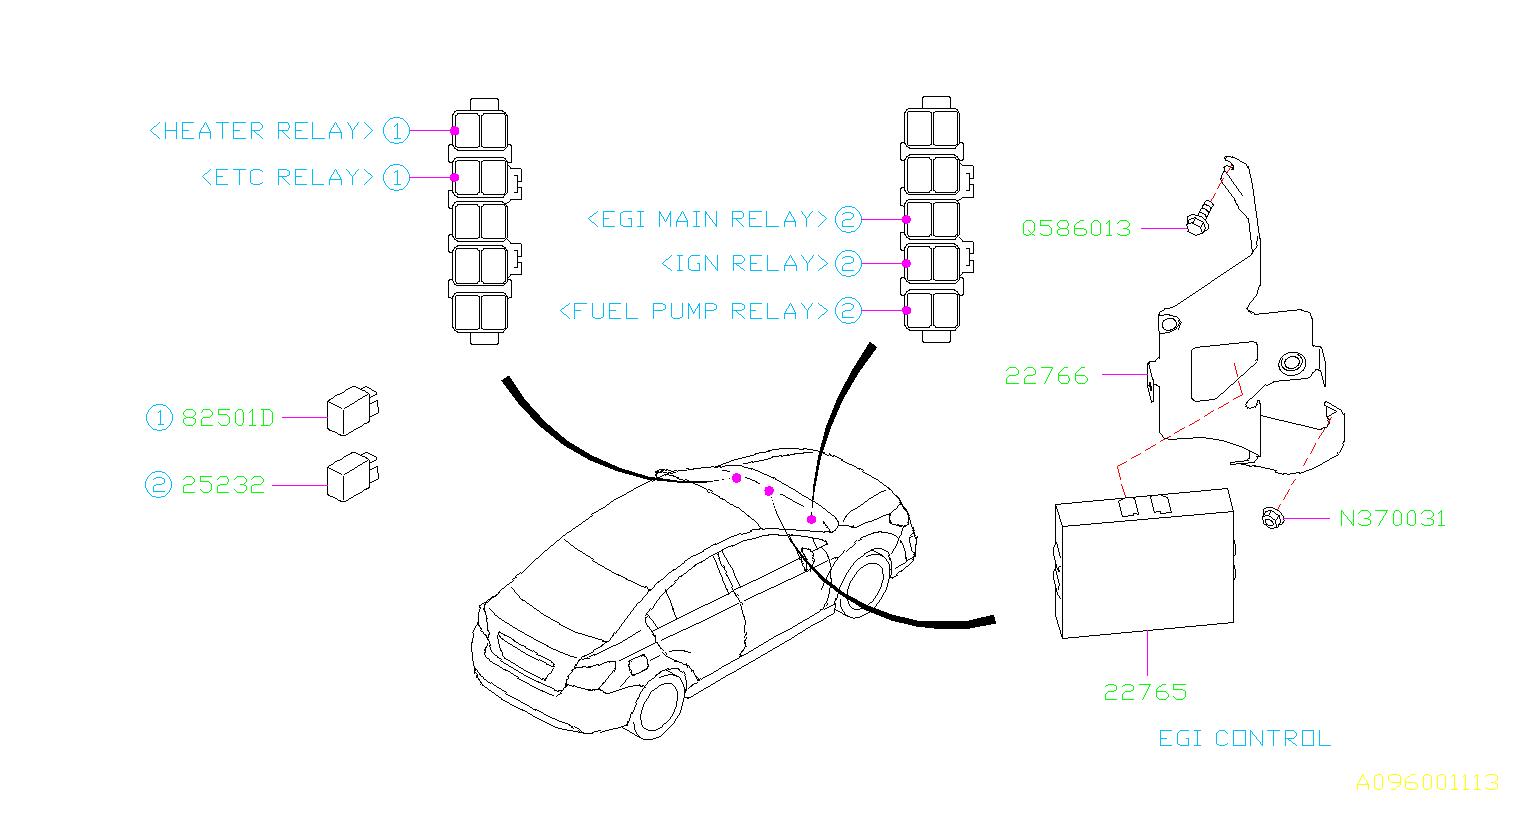 Subaru Impreza Unit Egi Control Engine Sensor Relay